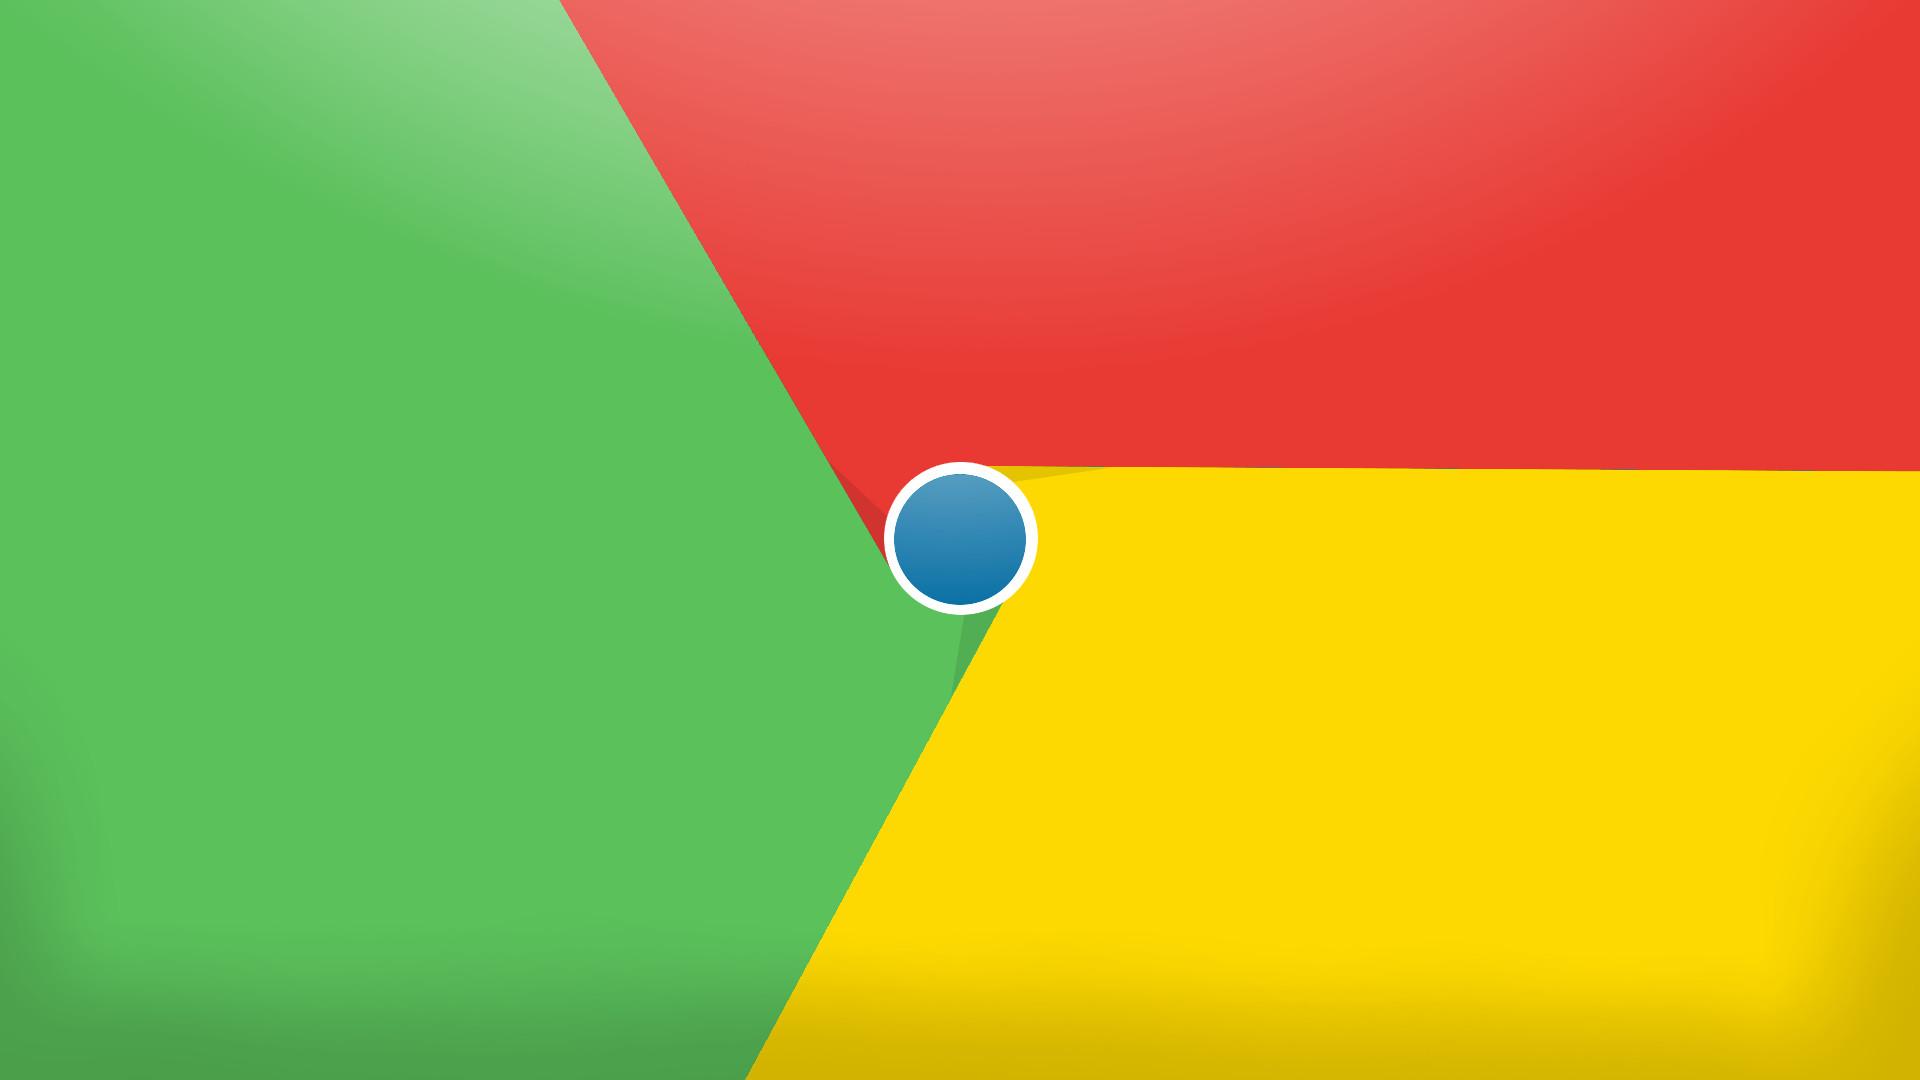 google wallpaper background 65 images